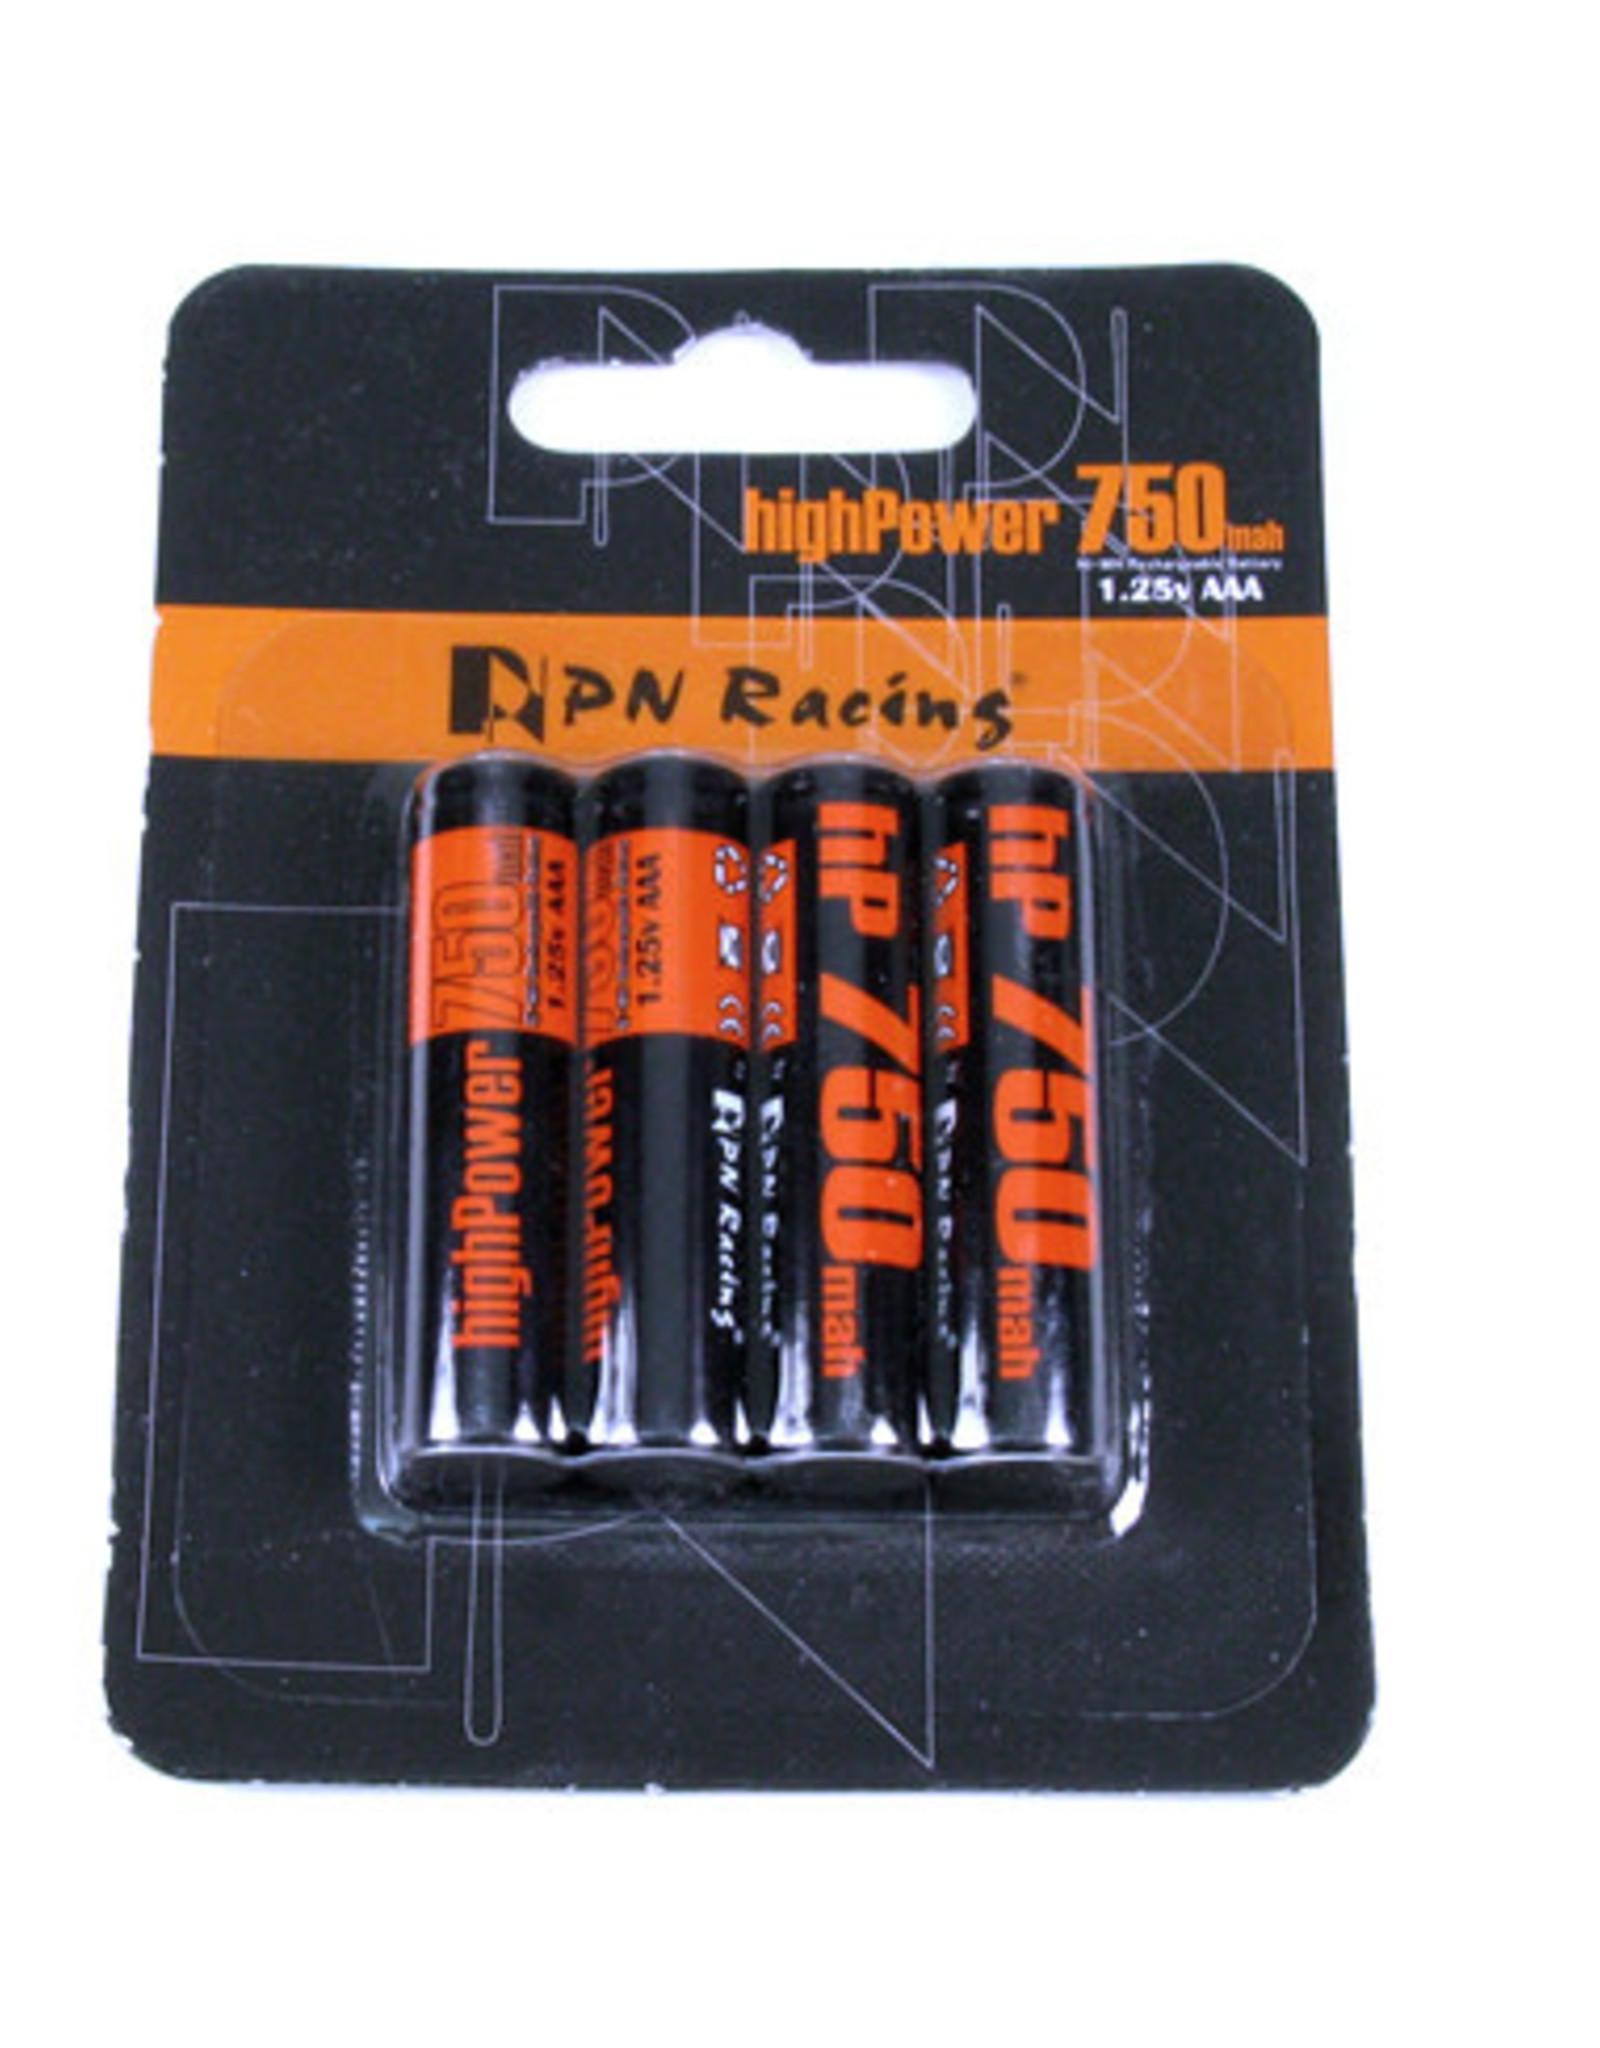 PN Racing PN Racing High Power 740mah Ni-MH Rechargeable AAA Battery (4pcs)